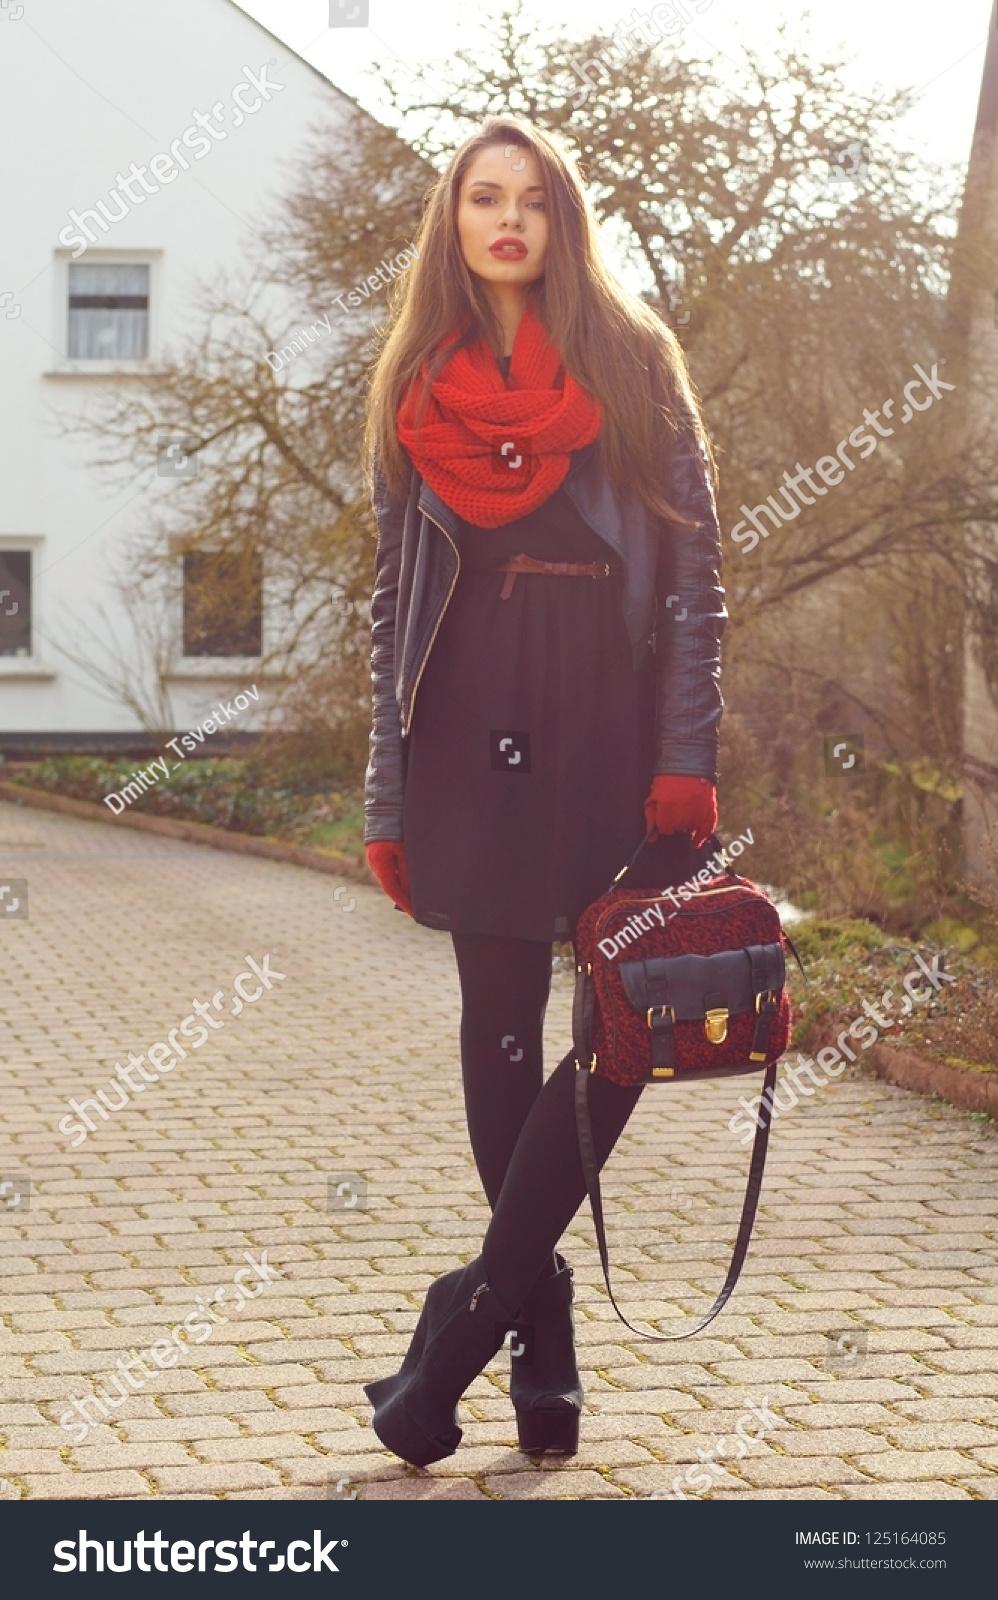 Black dress with red bag - Fashionable Stylish Girl In Black Dress And Leather Jacket With Red Bag